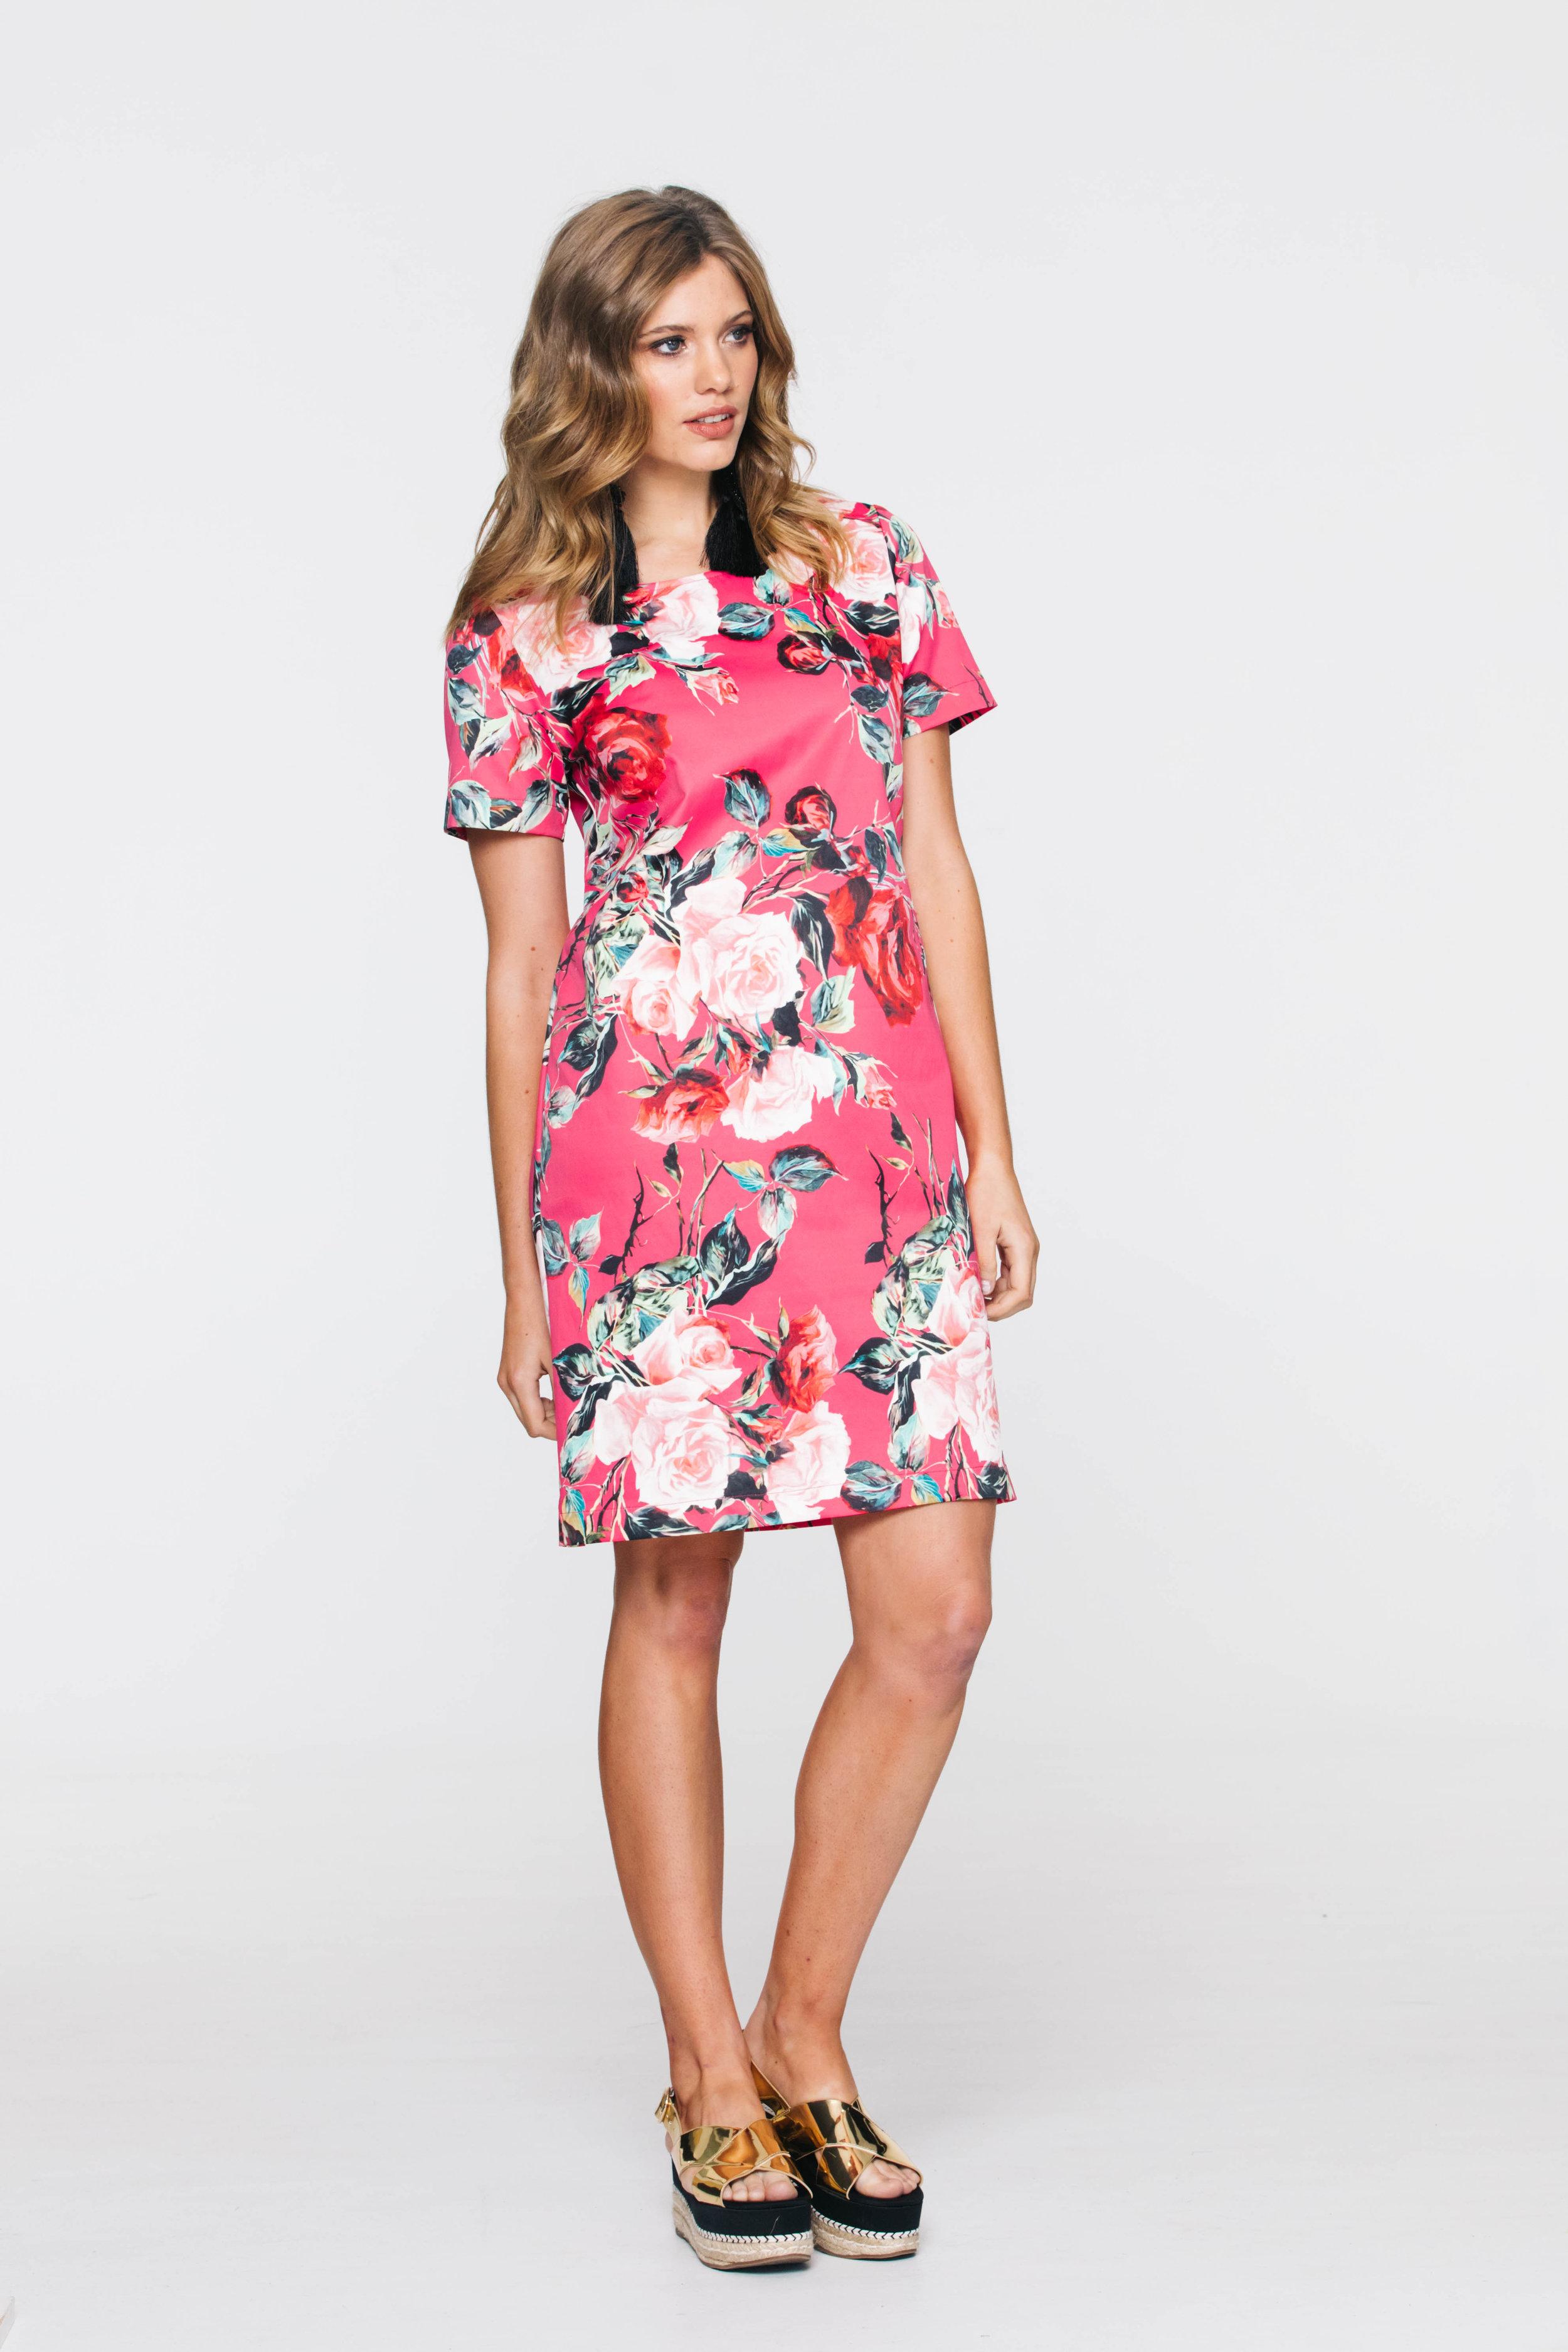 5736V Liberty Dress, Dolce Rose Hot Pink